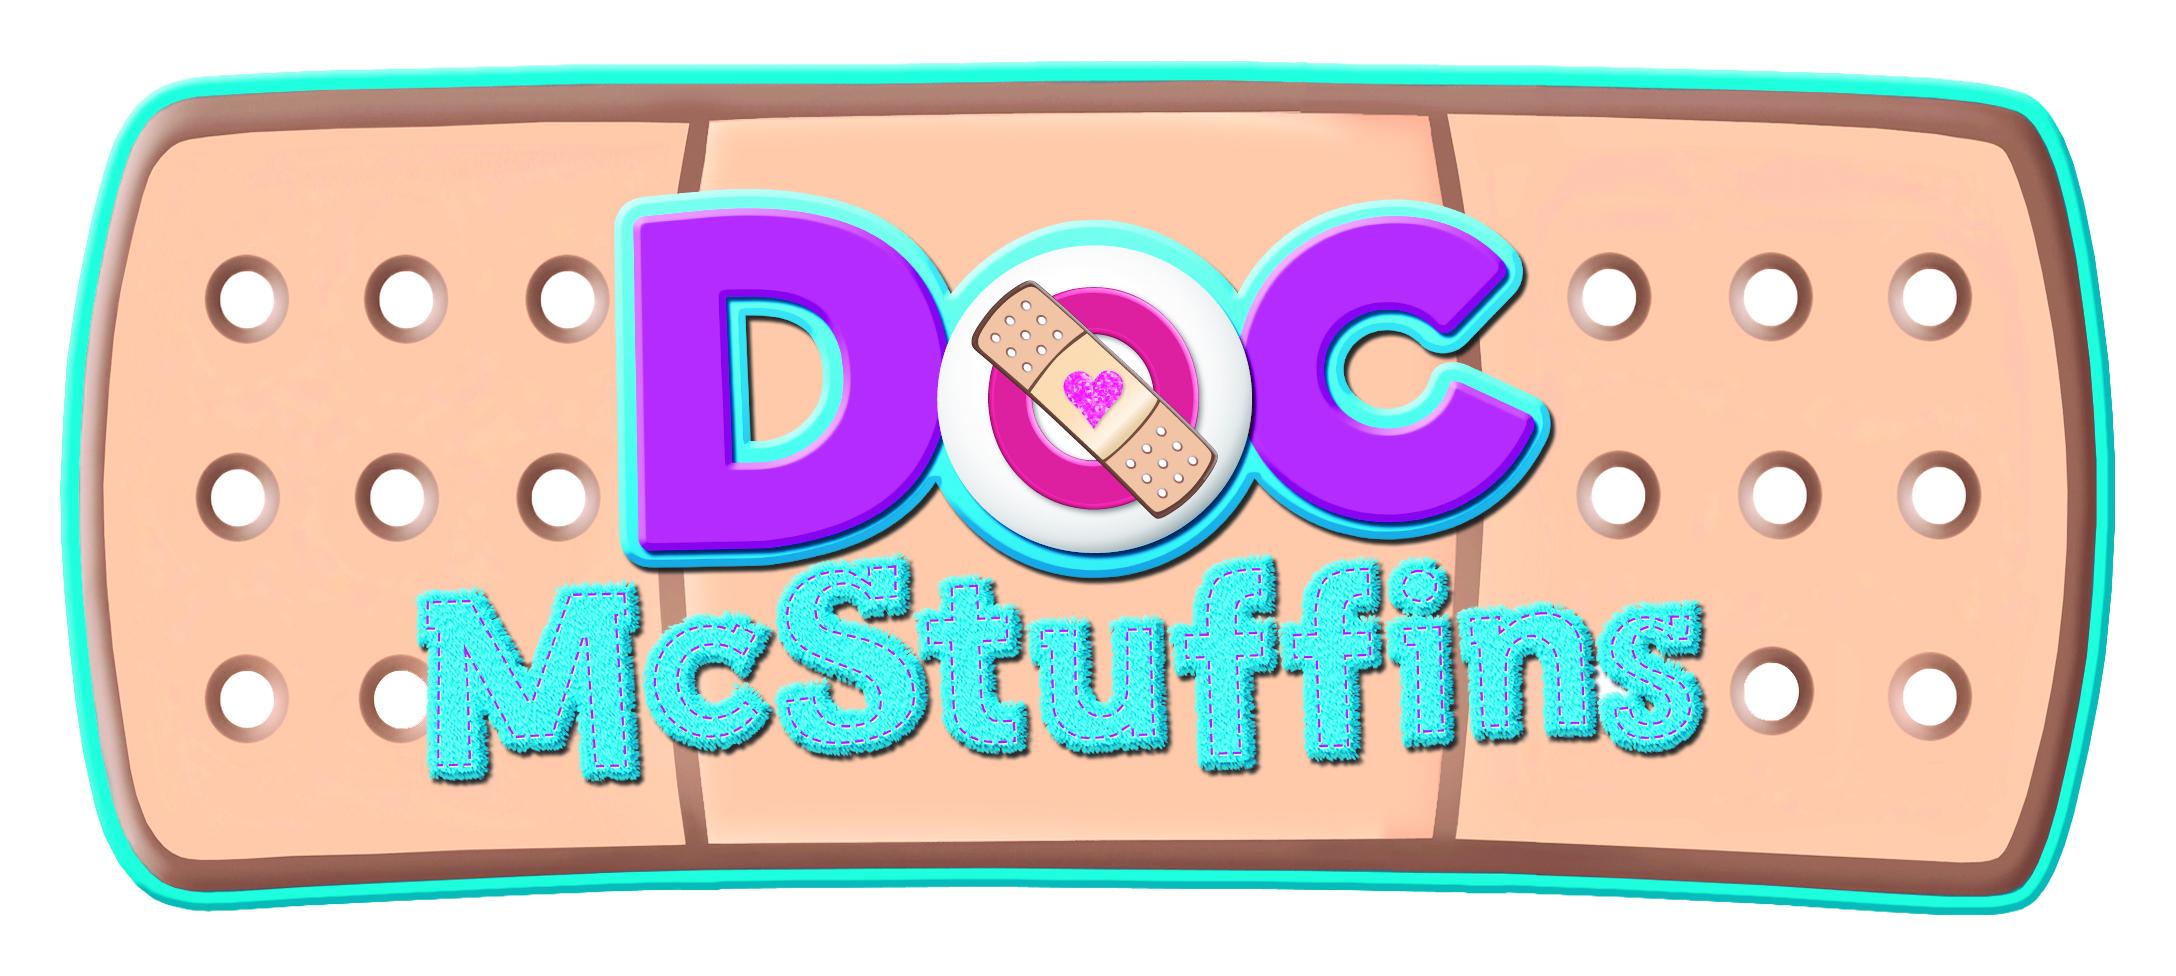 Doc McStuffins Clip Art Logo free image.